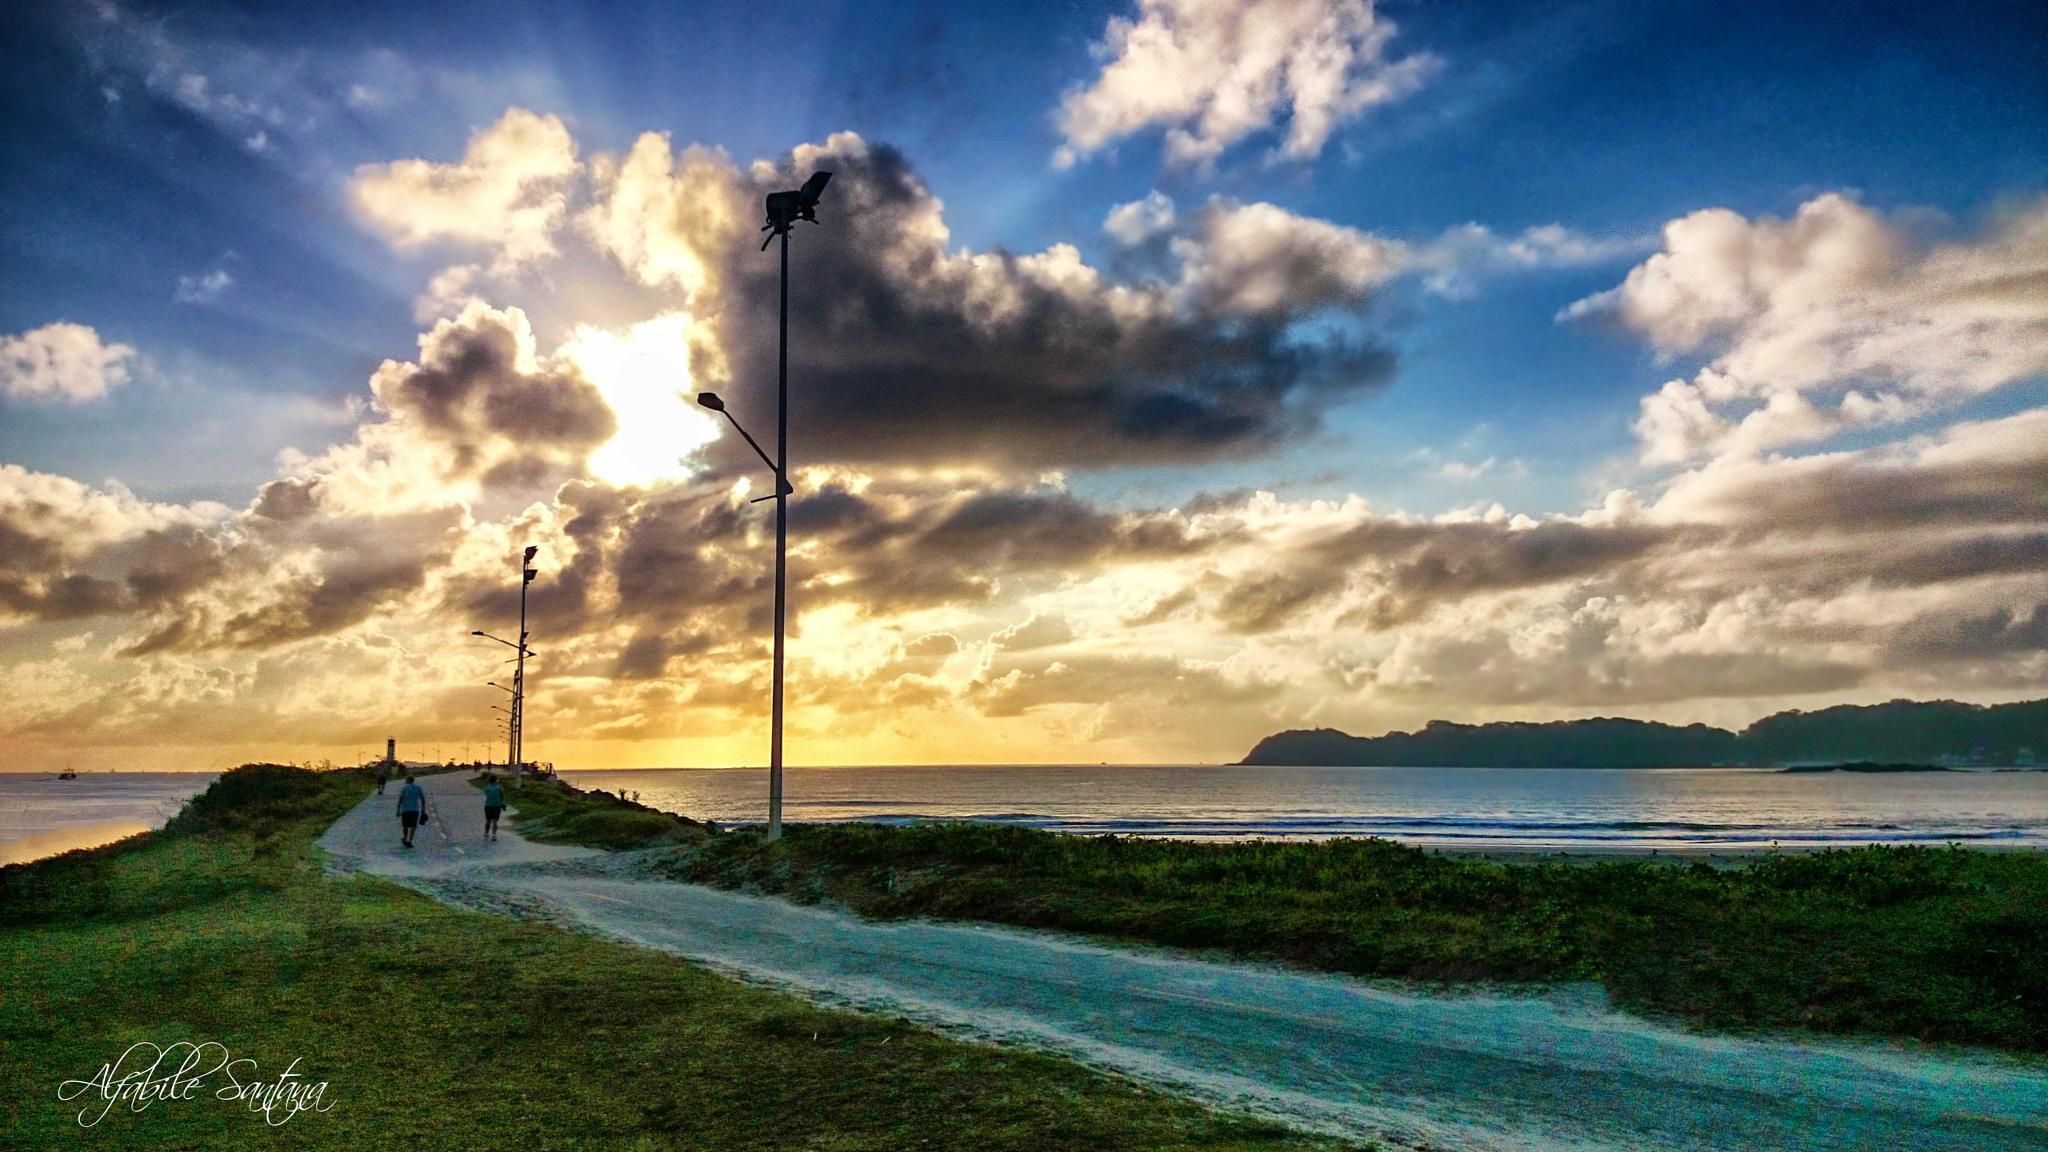 Sunrise in Atalaia Beach by Alfabile